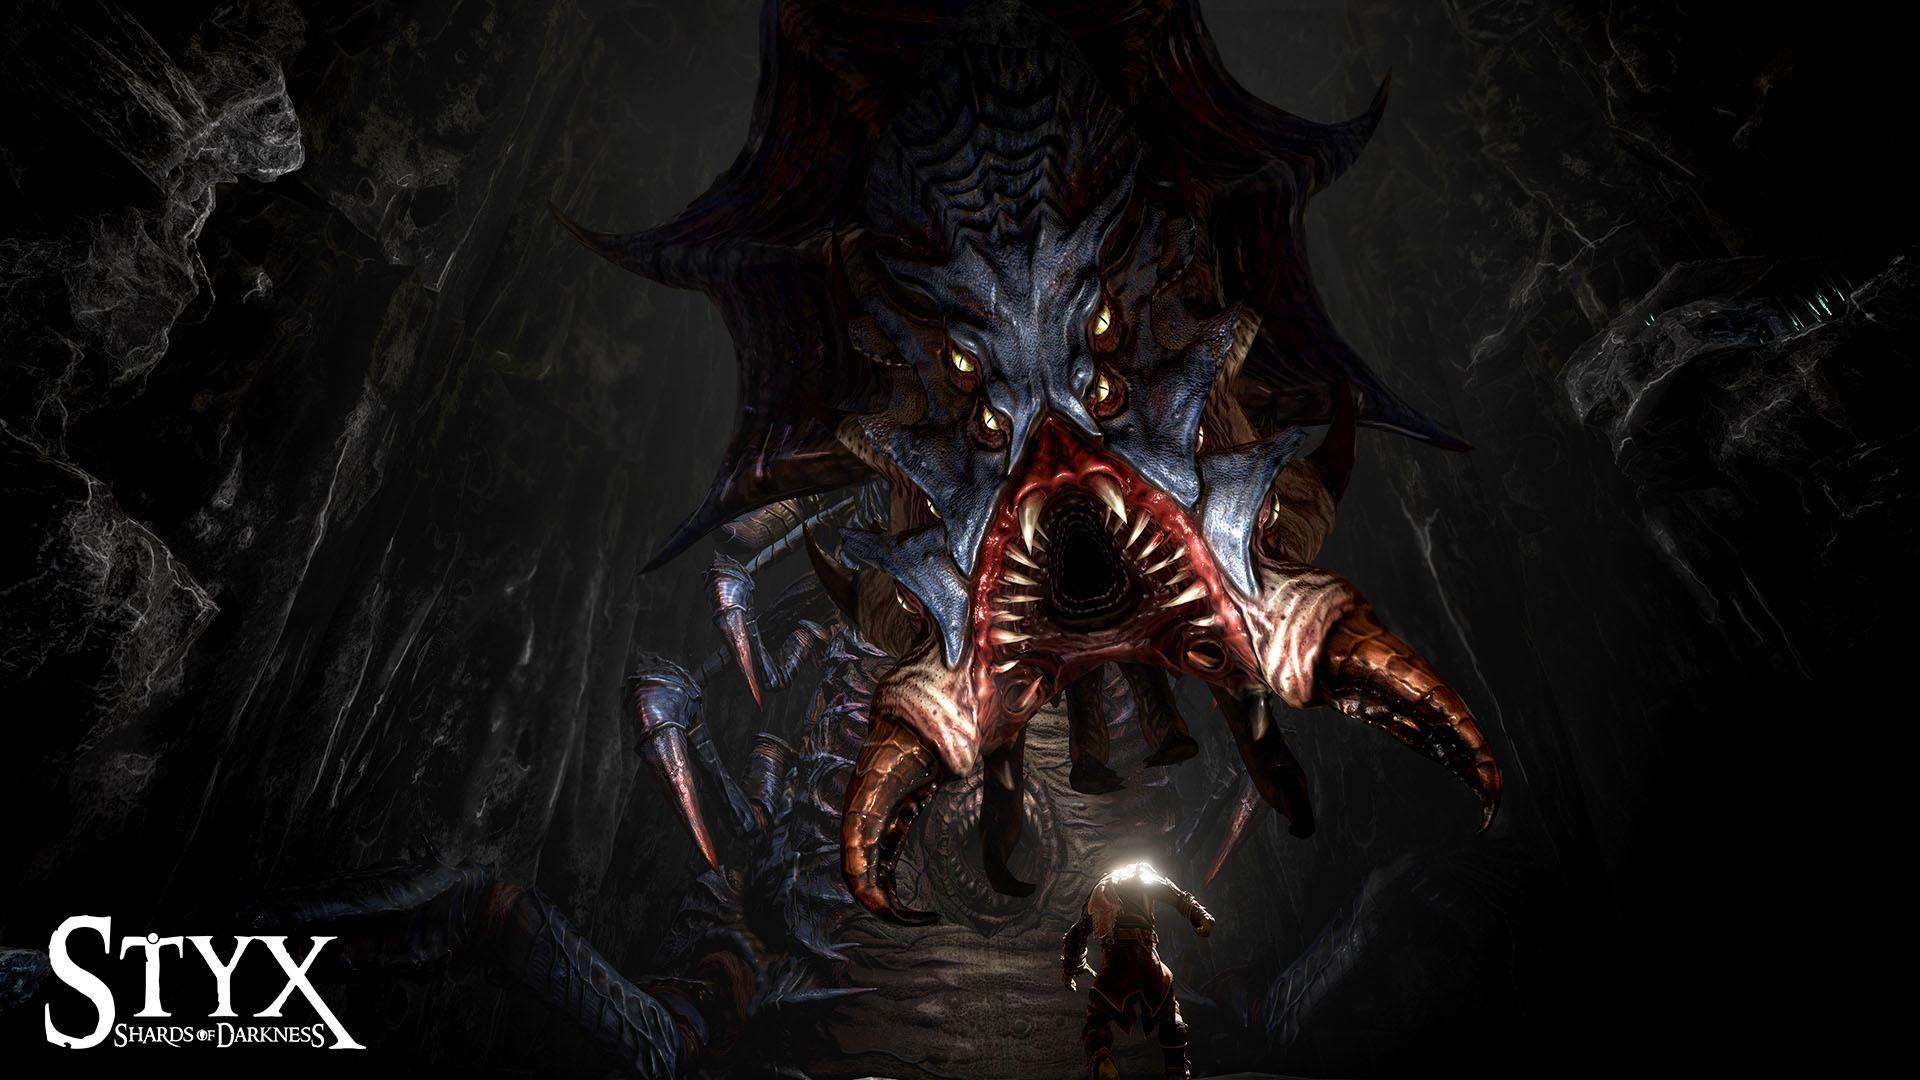 styx_shards_of_darkness_07